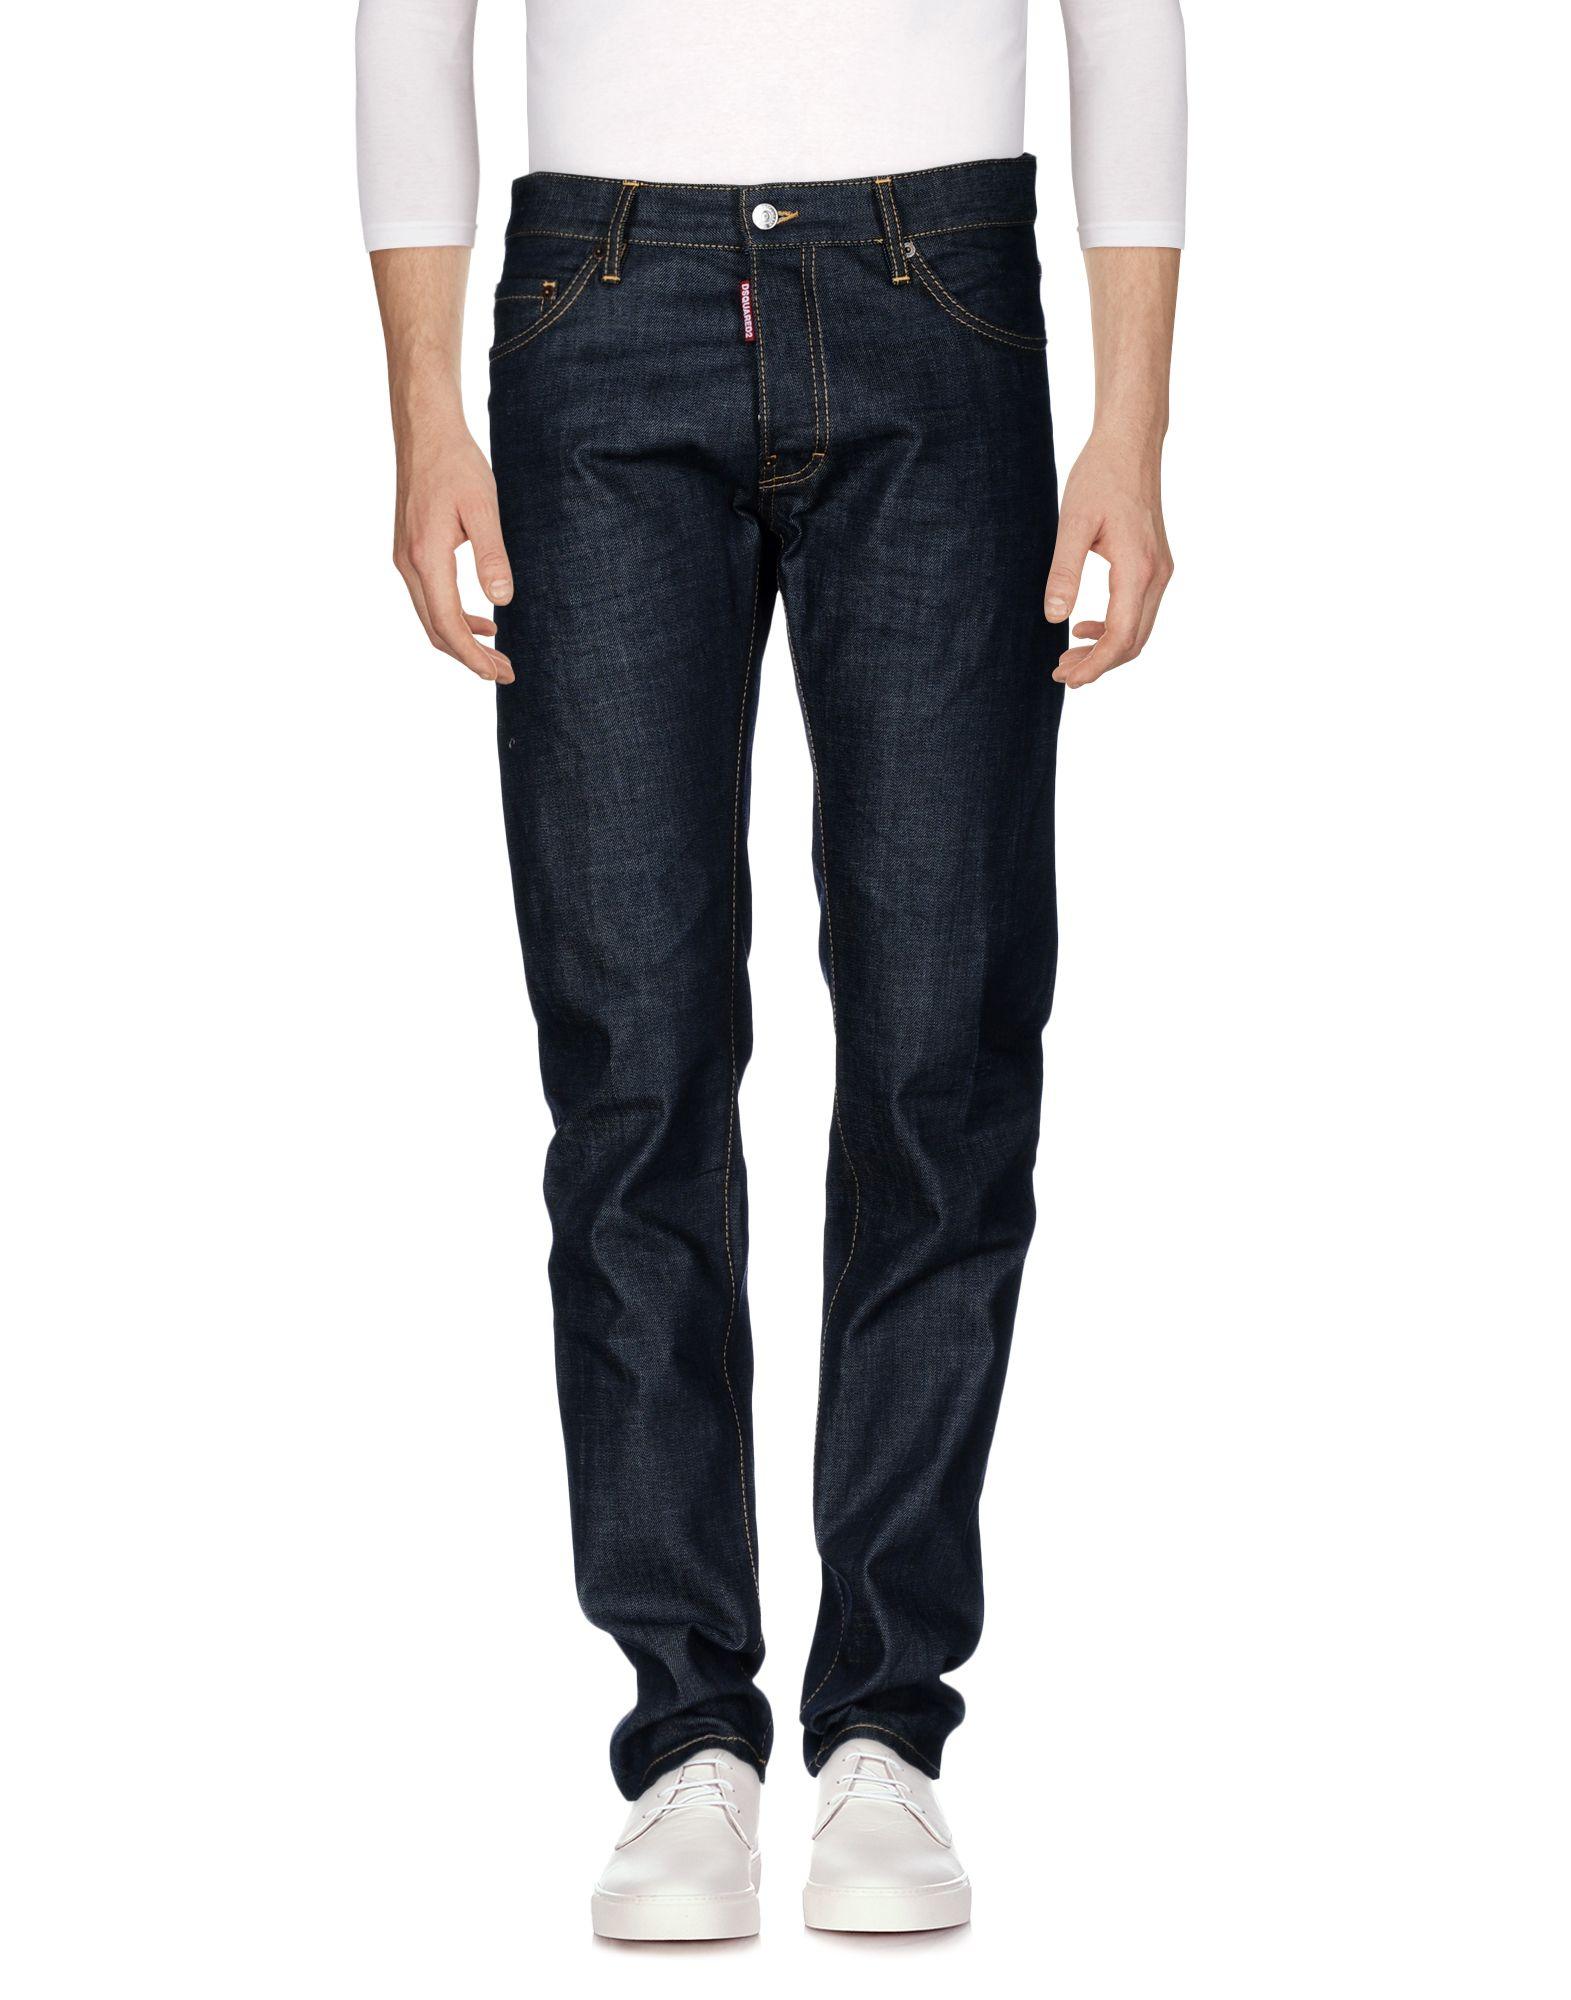 c62982edda Dsquared2 Pantaloni Jeans - Dsquared2 Uomo - YOOX